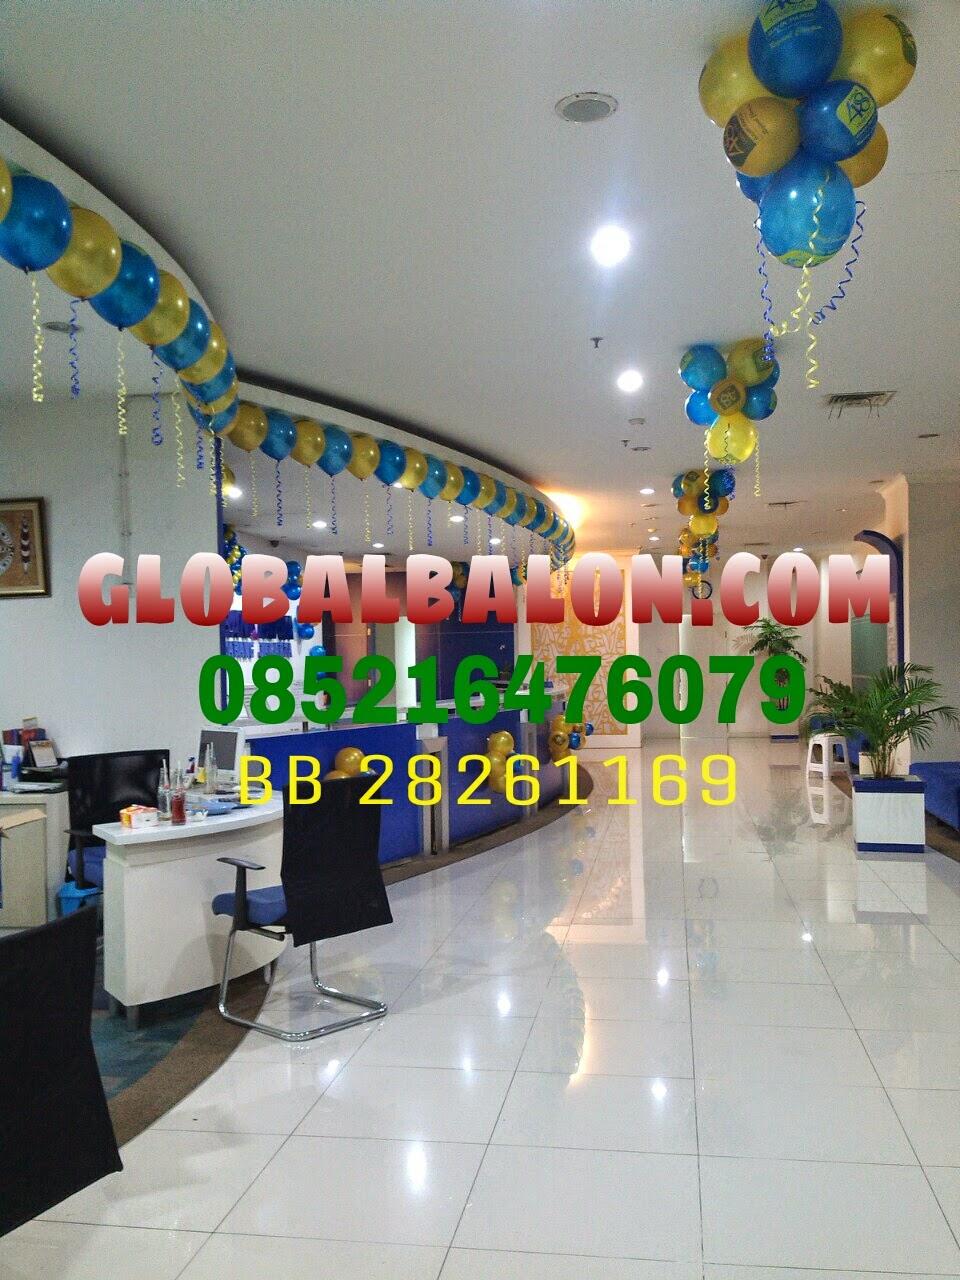 Global balonku balon dekorasi ultah balon dekorasi for Dekor kamar hotel buat ulang tahun